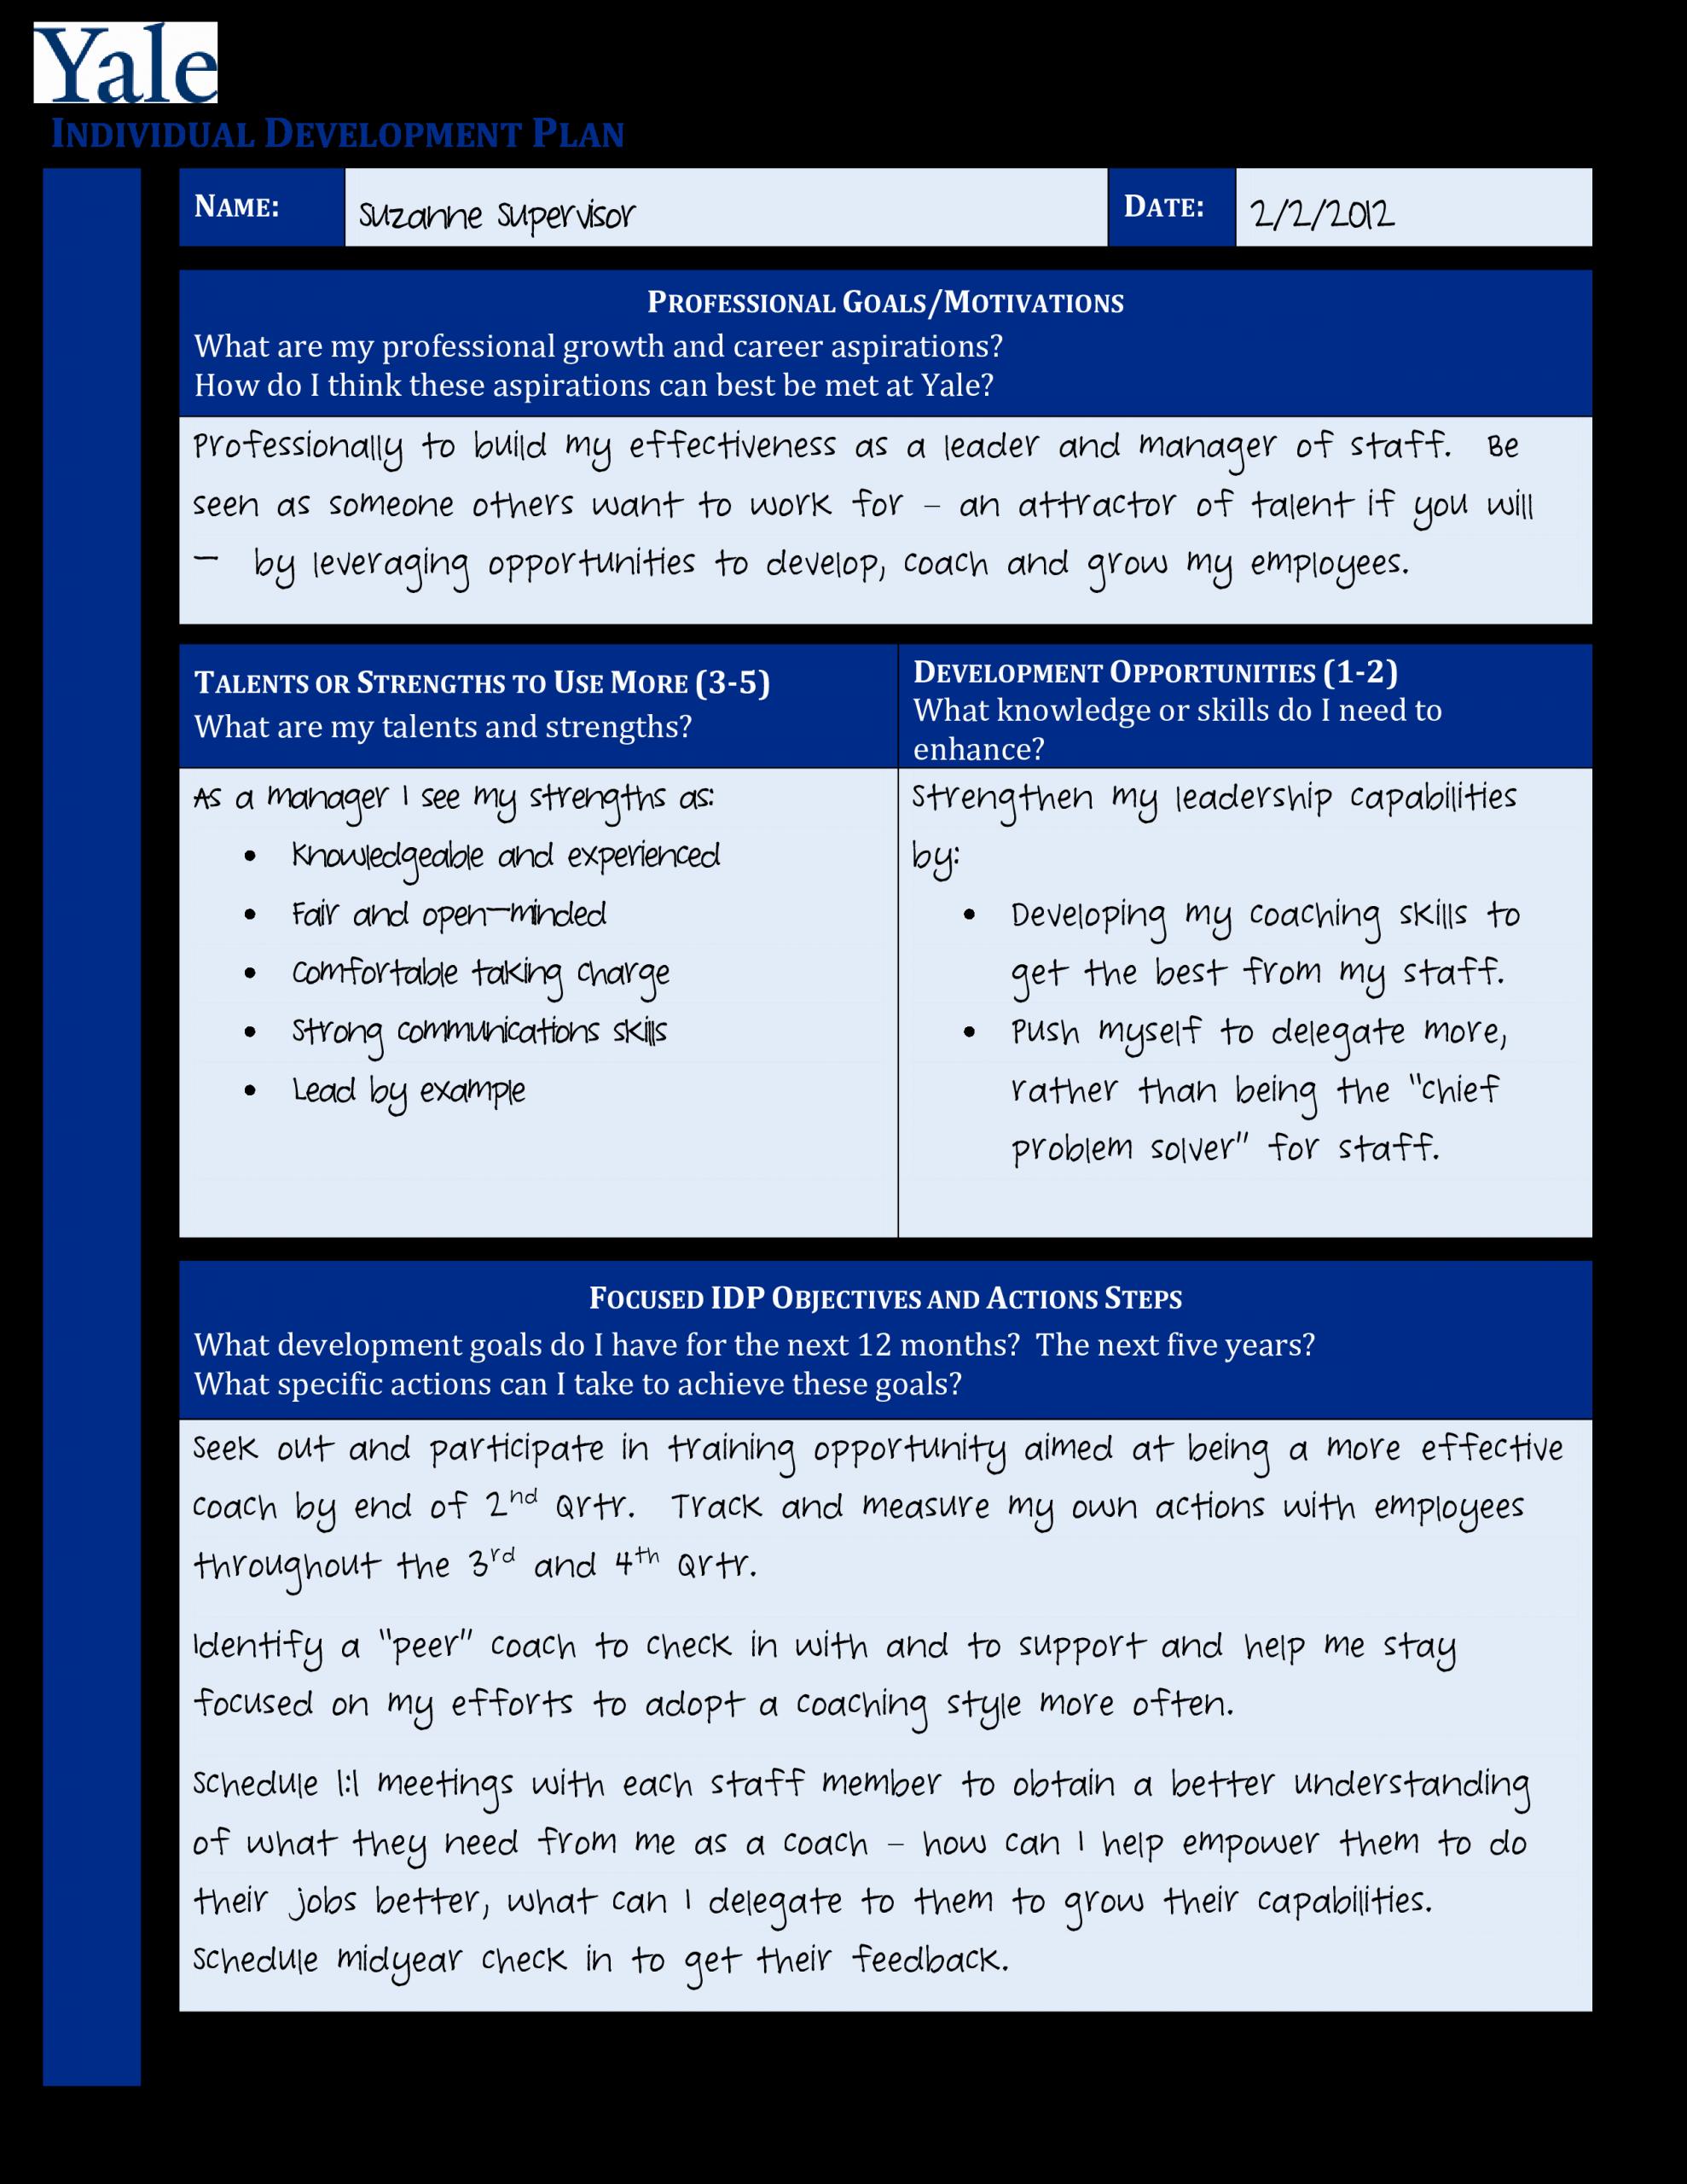 Individual Professional Development Plan Samples Lovely Individual Personal Development Plan